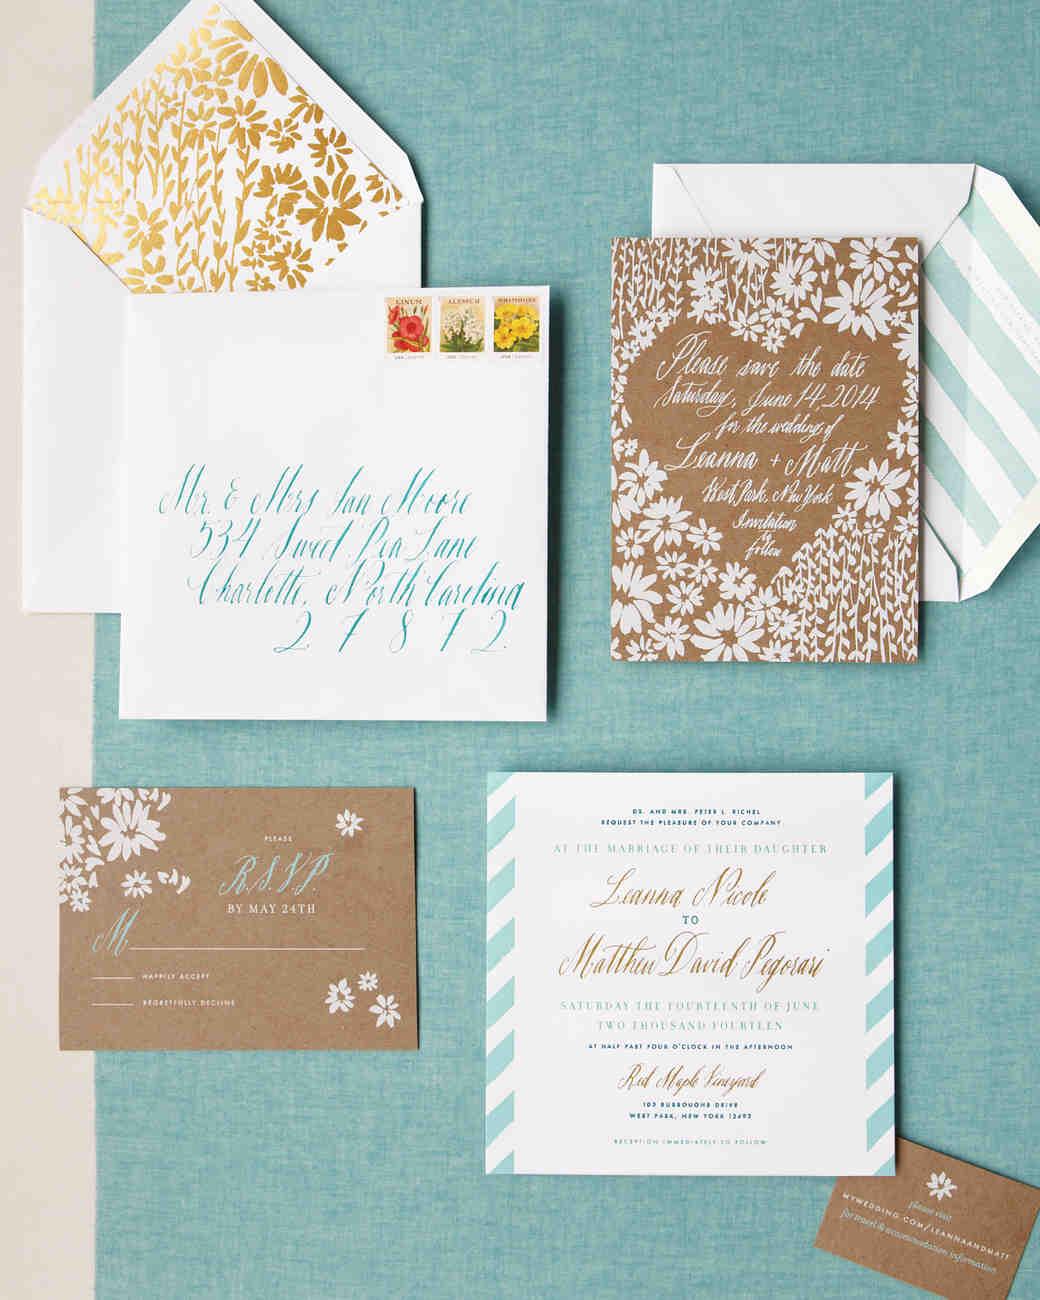 leanna-matt-wedding-invite-suite-0028-s111371.jpg